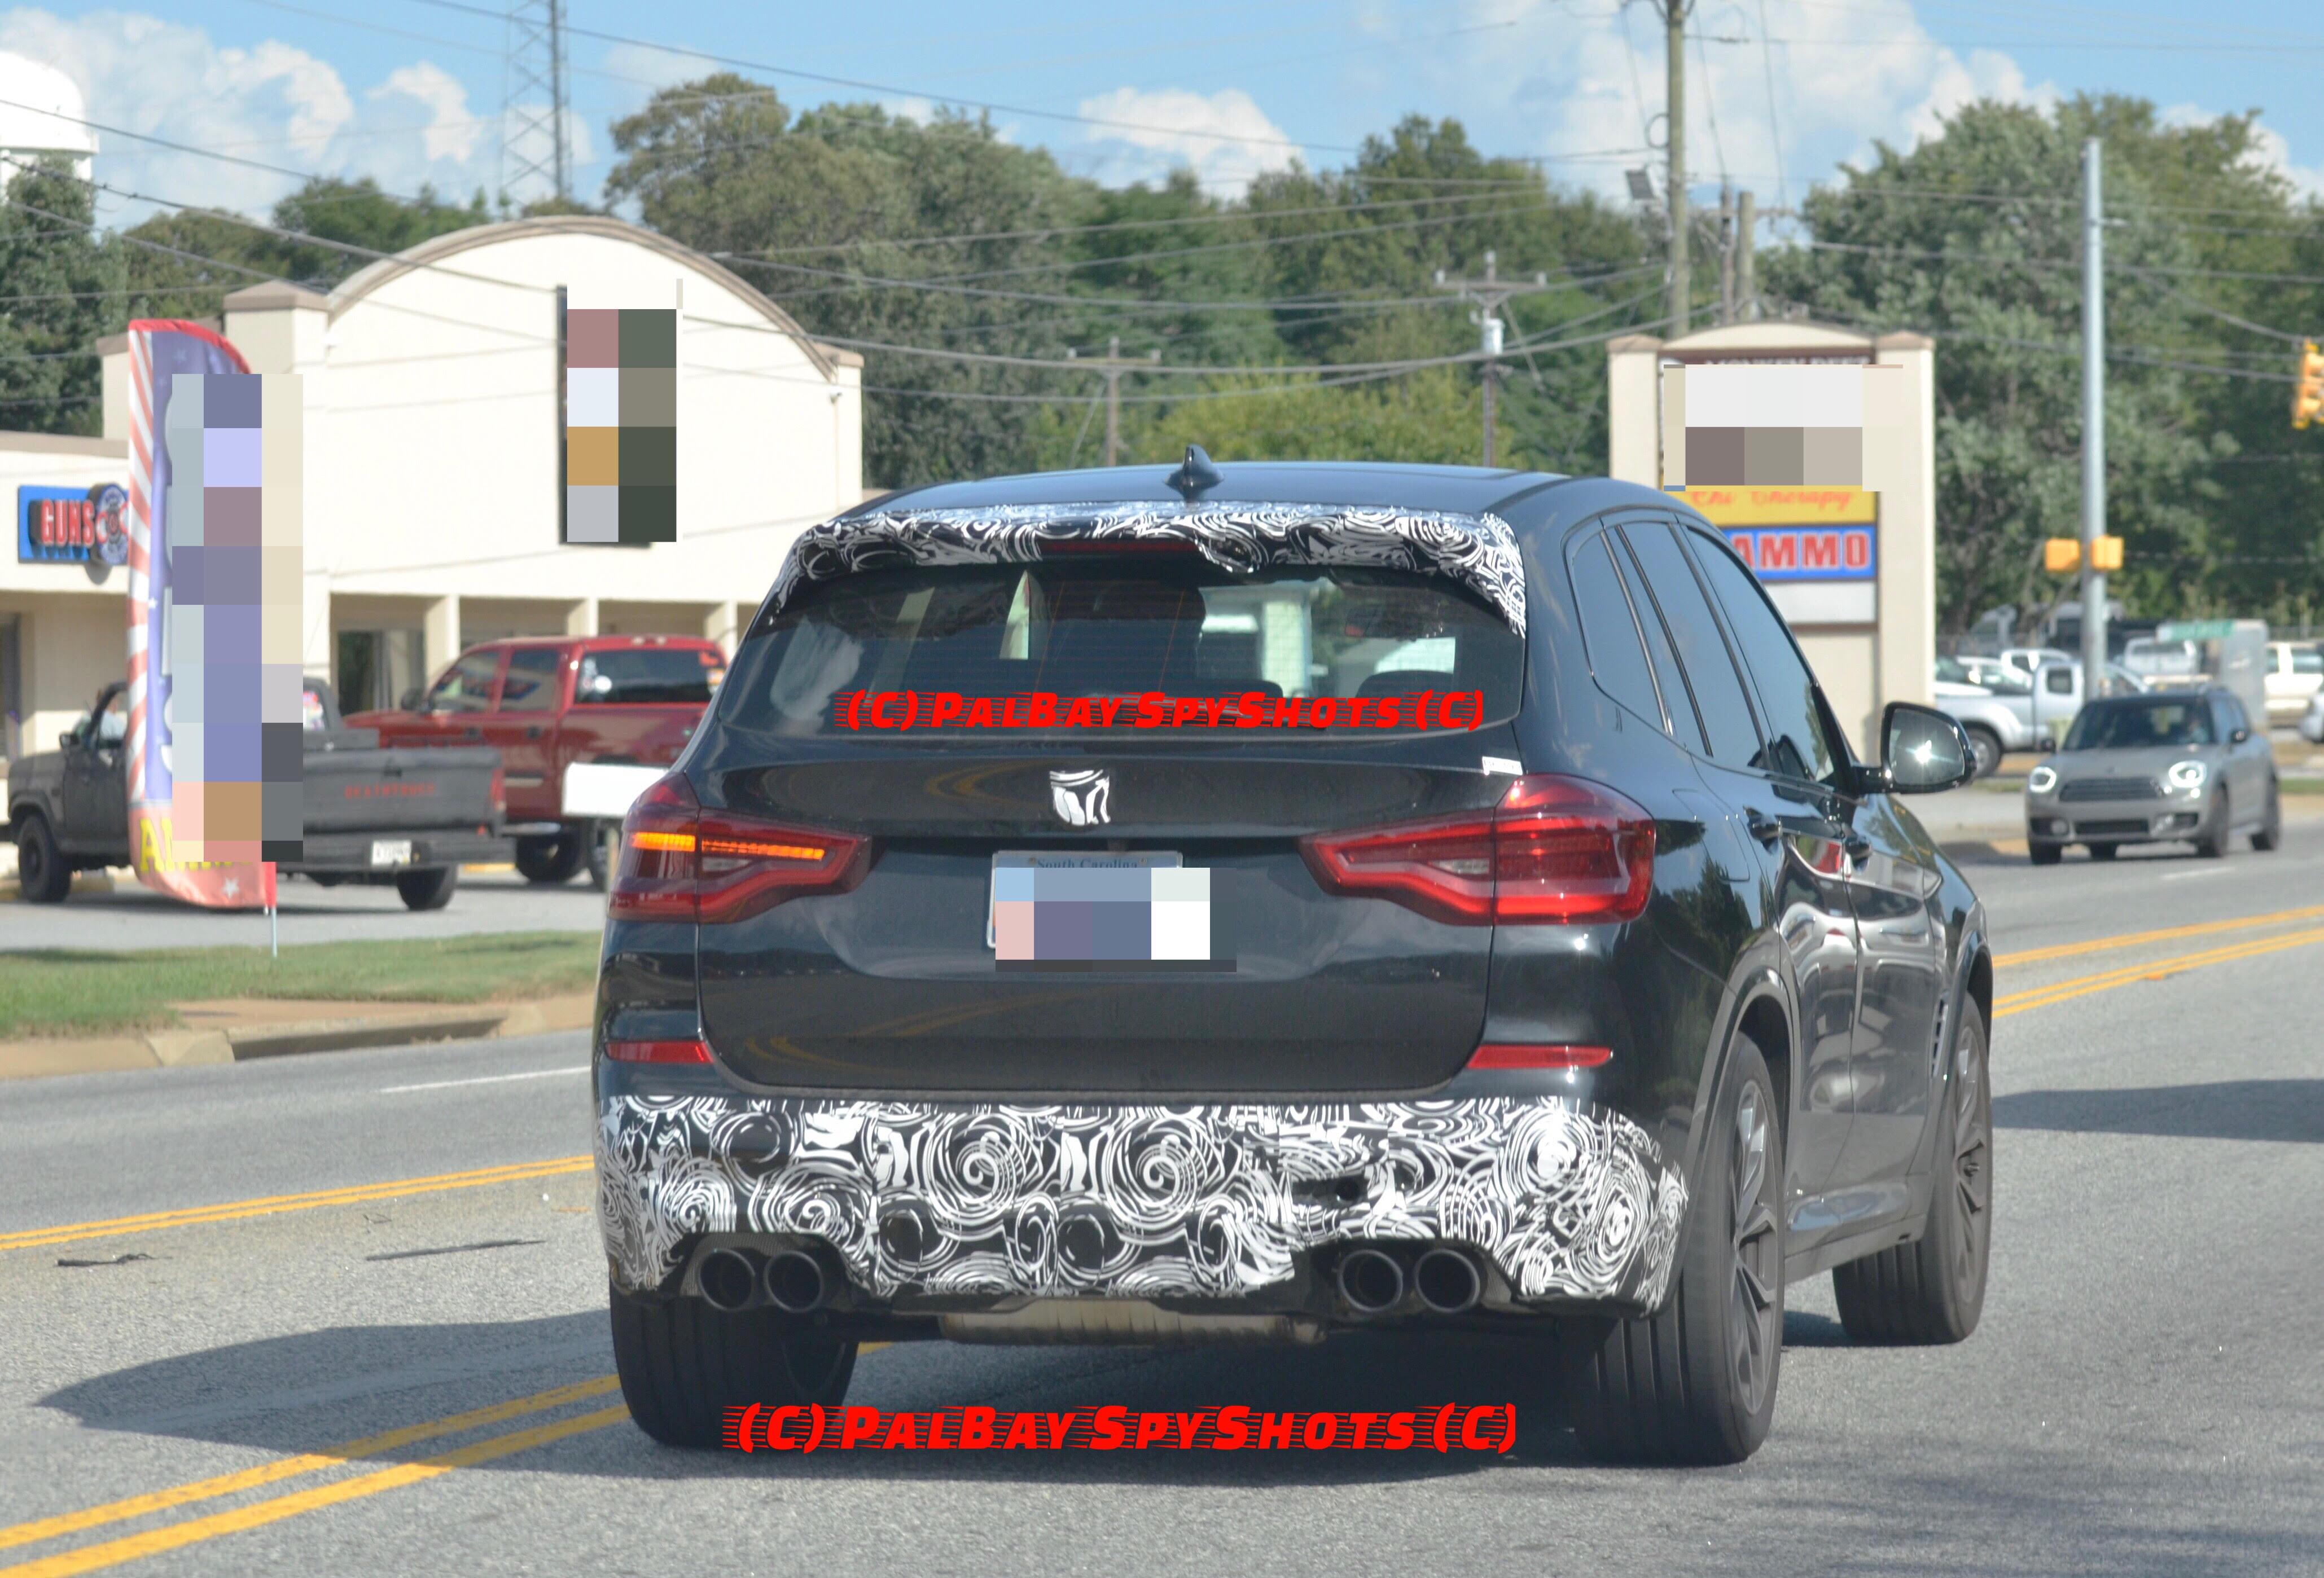 BMW F97 X3M 2018 image 2